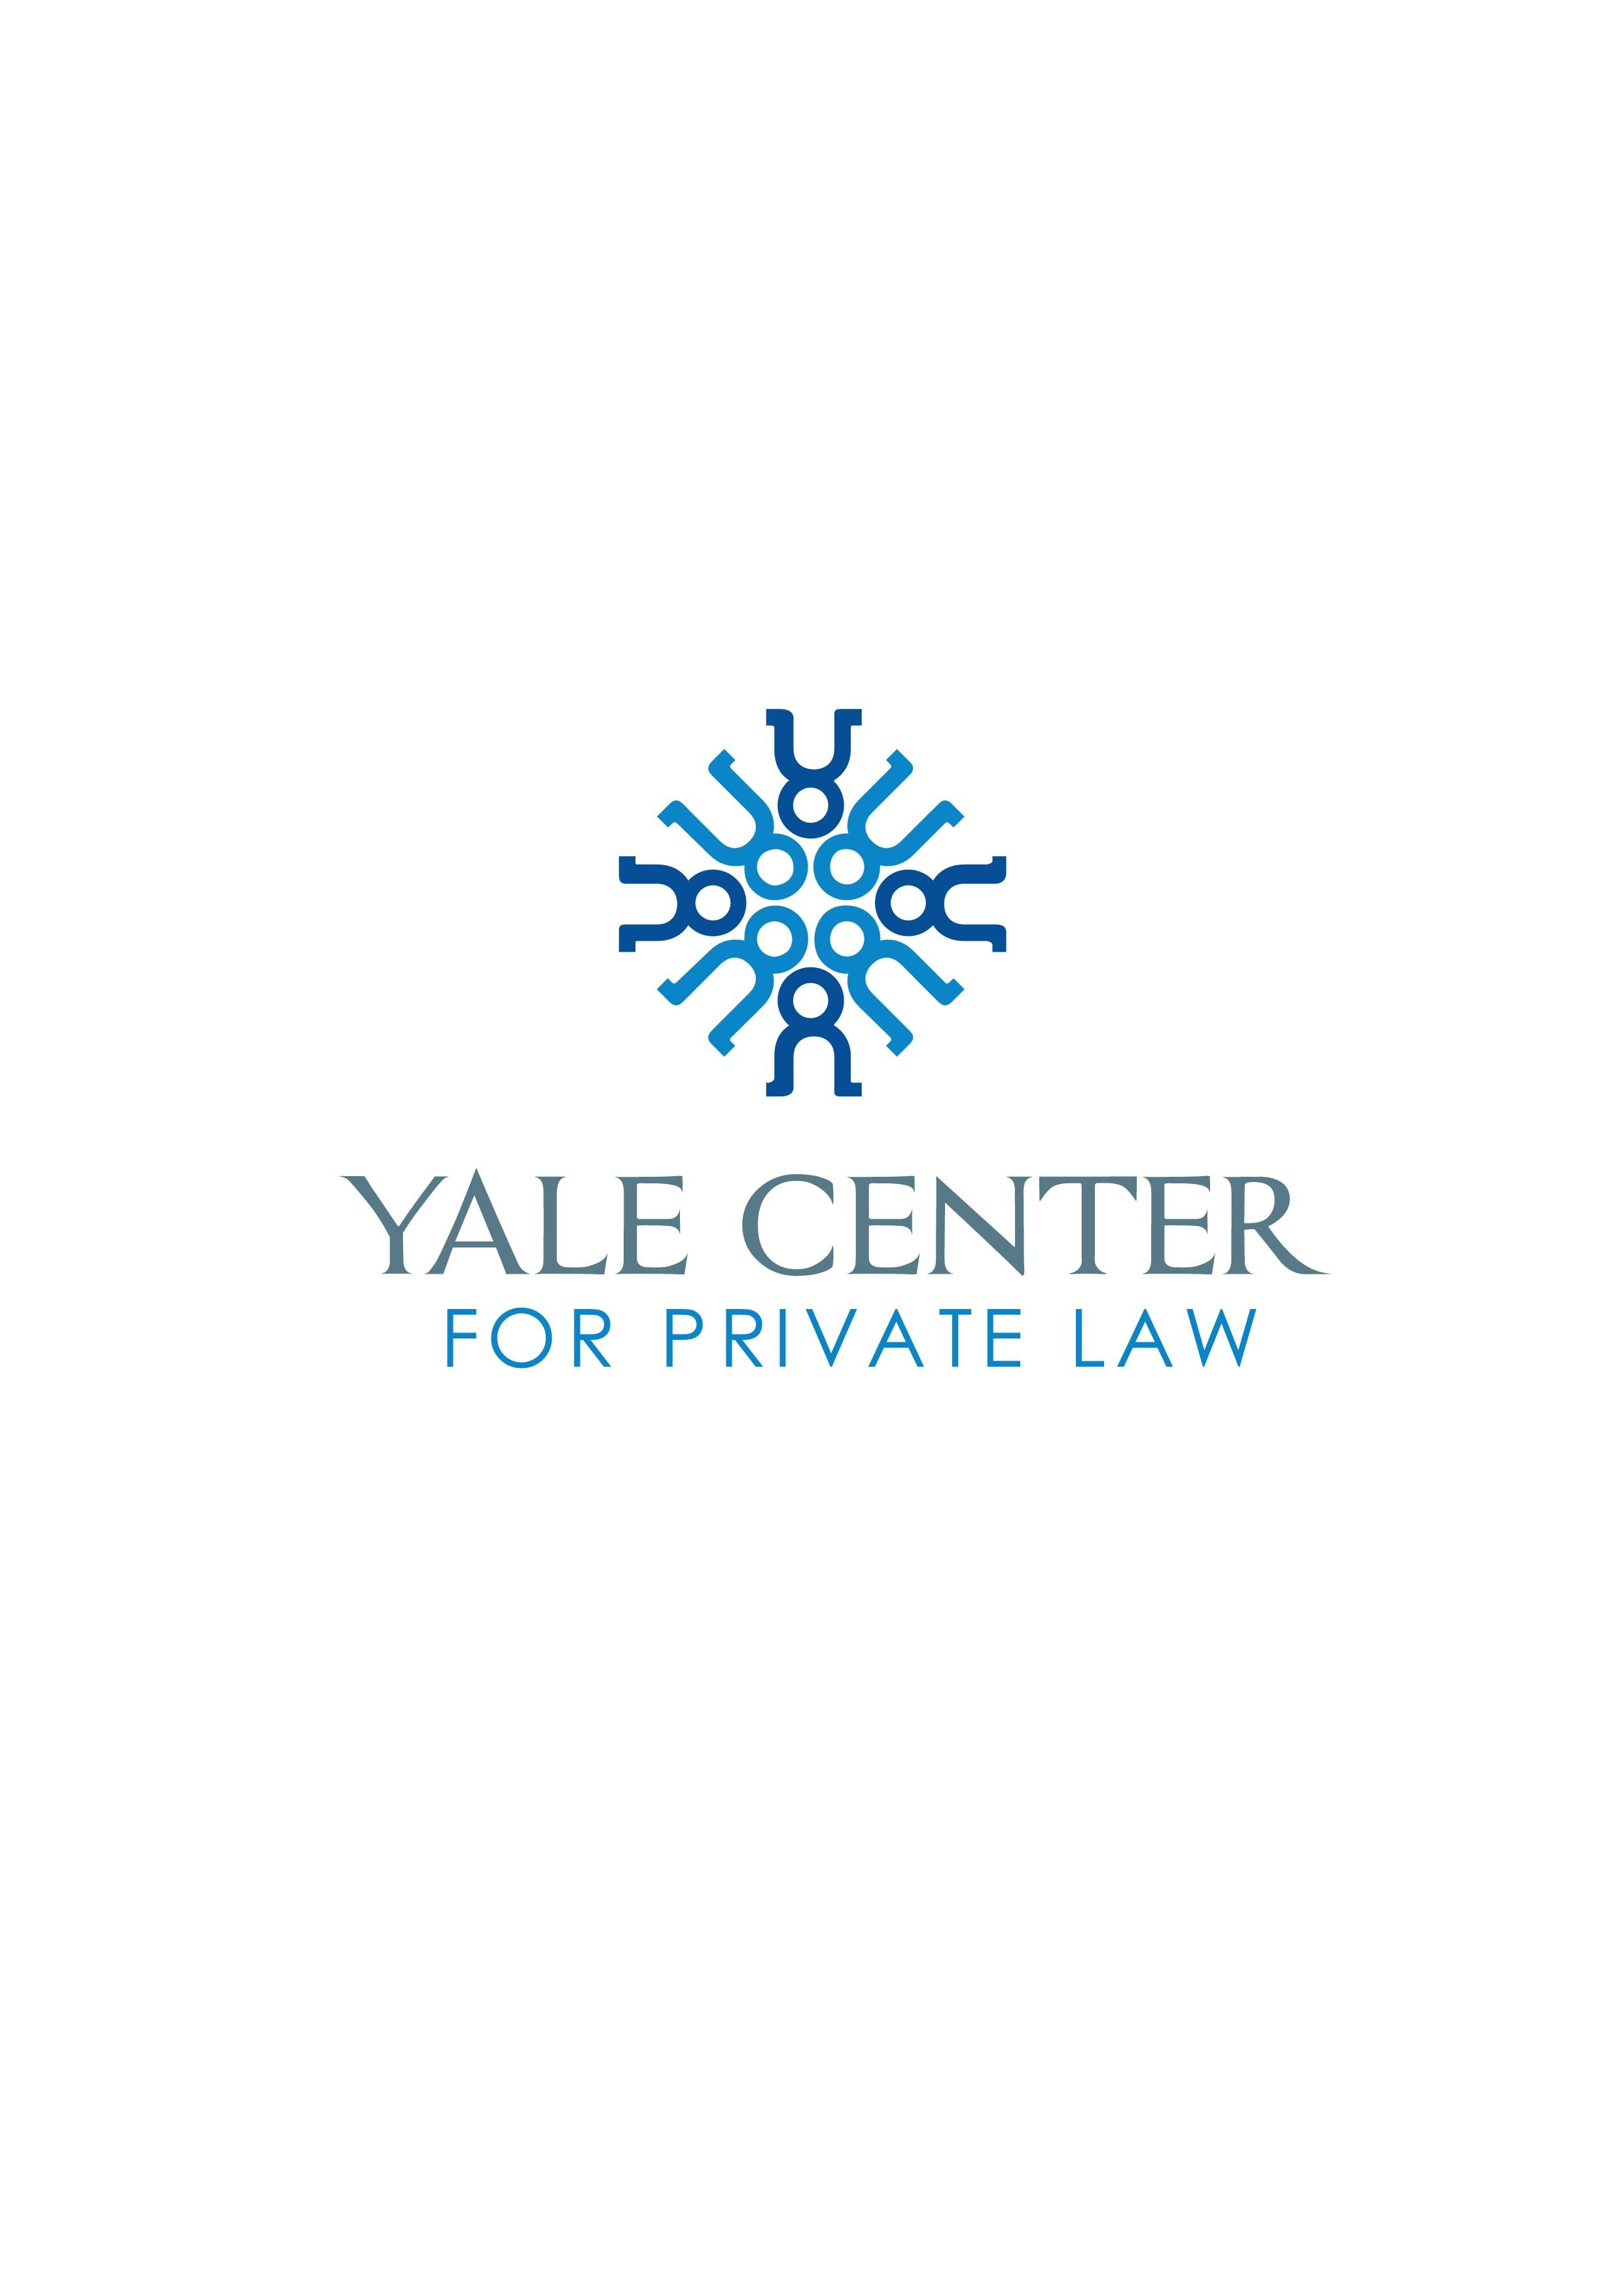 Create a logo for an elite academic center with global reach